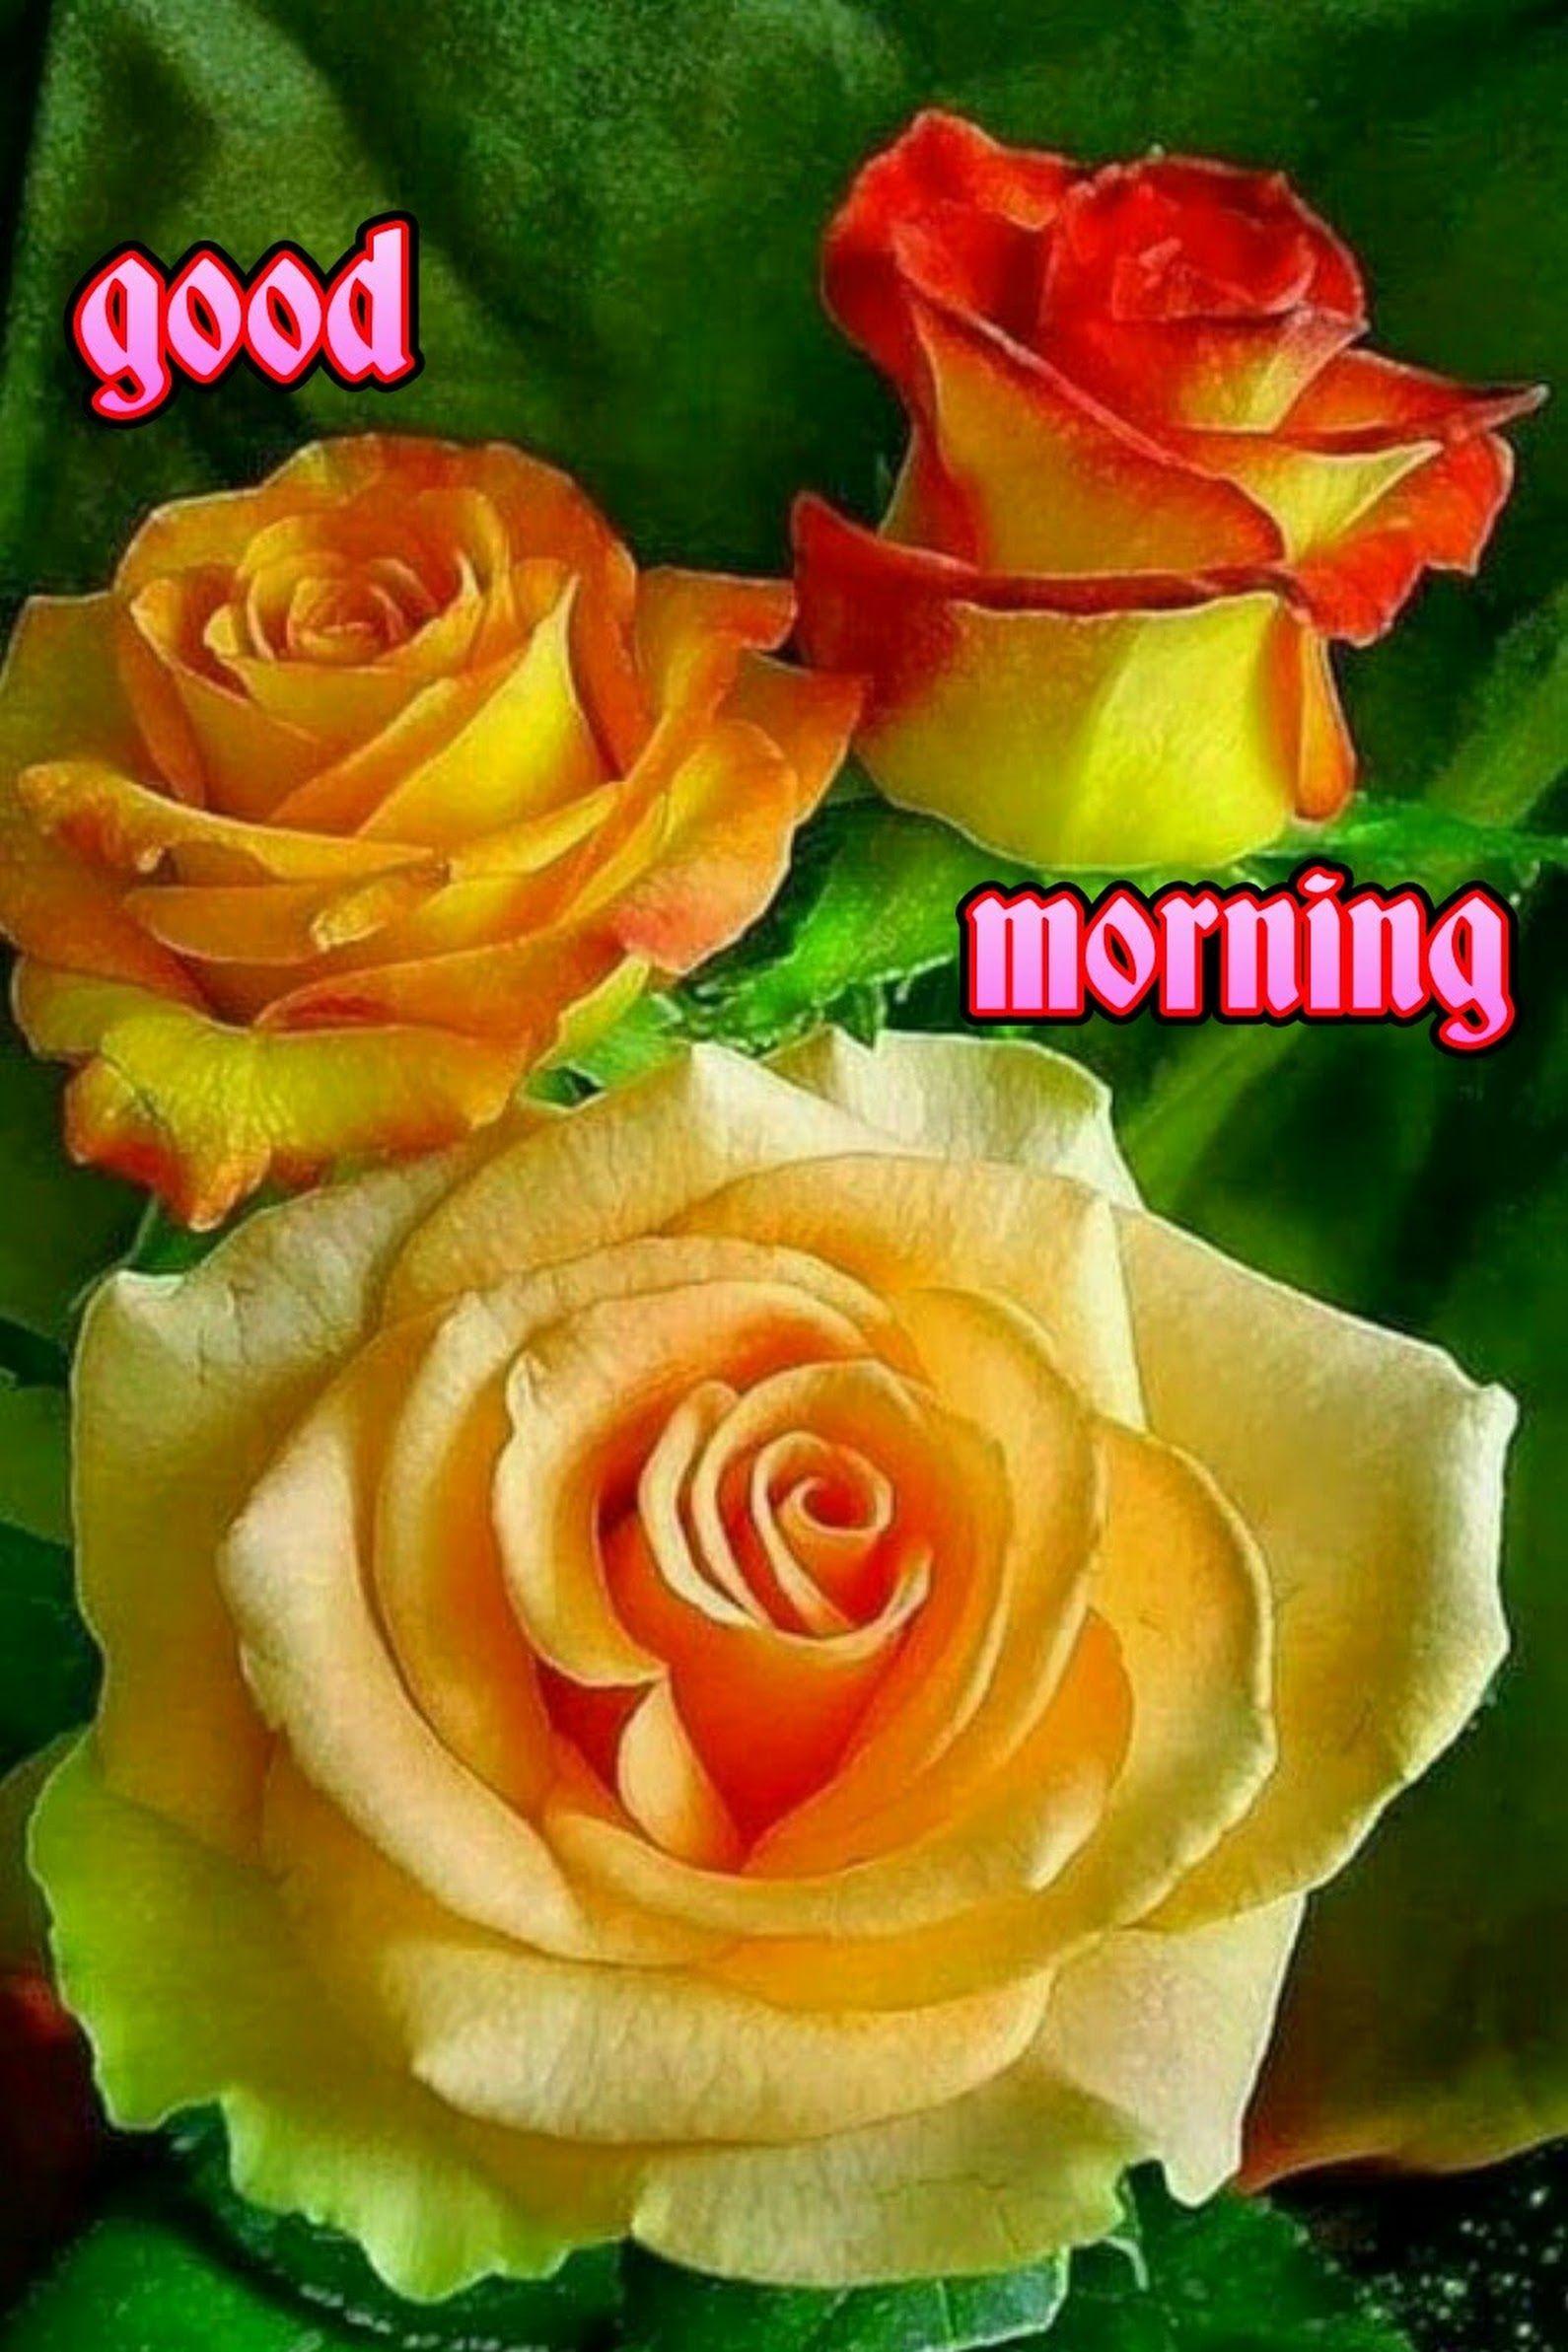 Good Morning Kishor Ekatpure Google Good Morning Pinterest